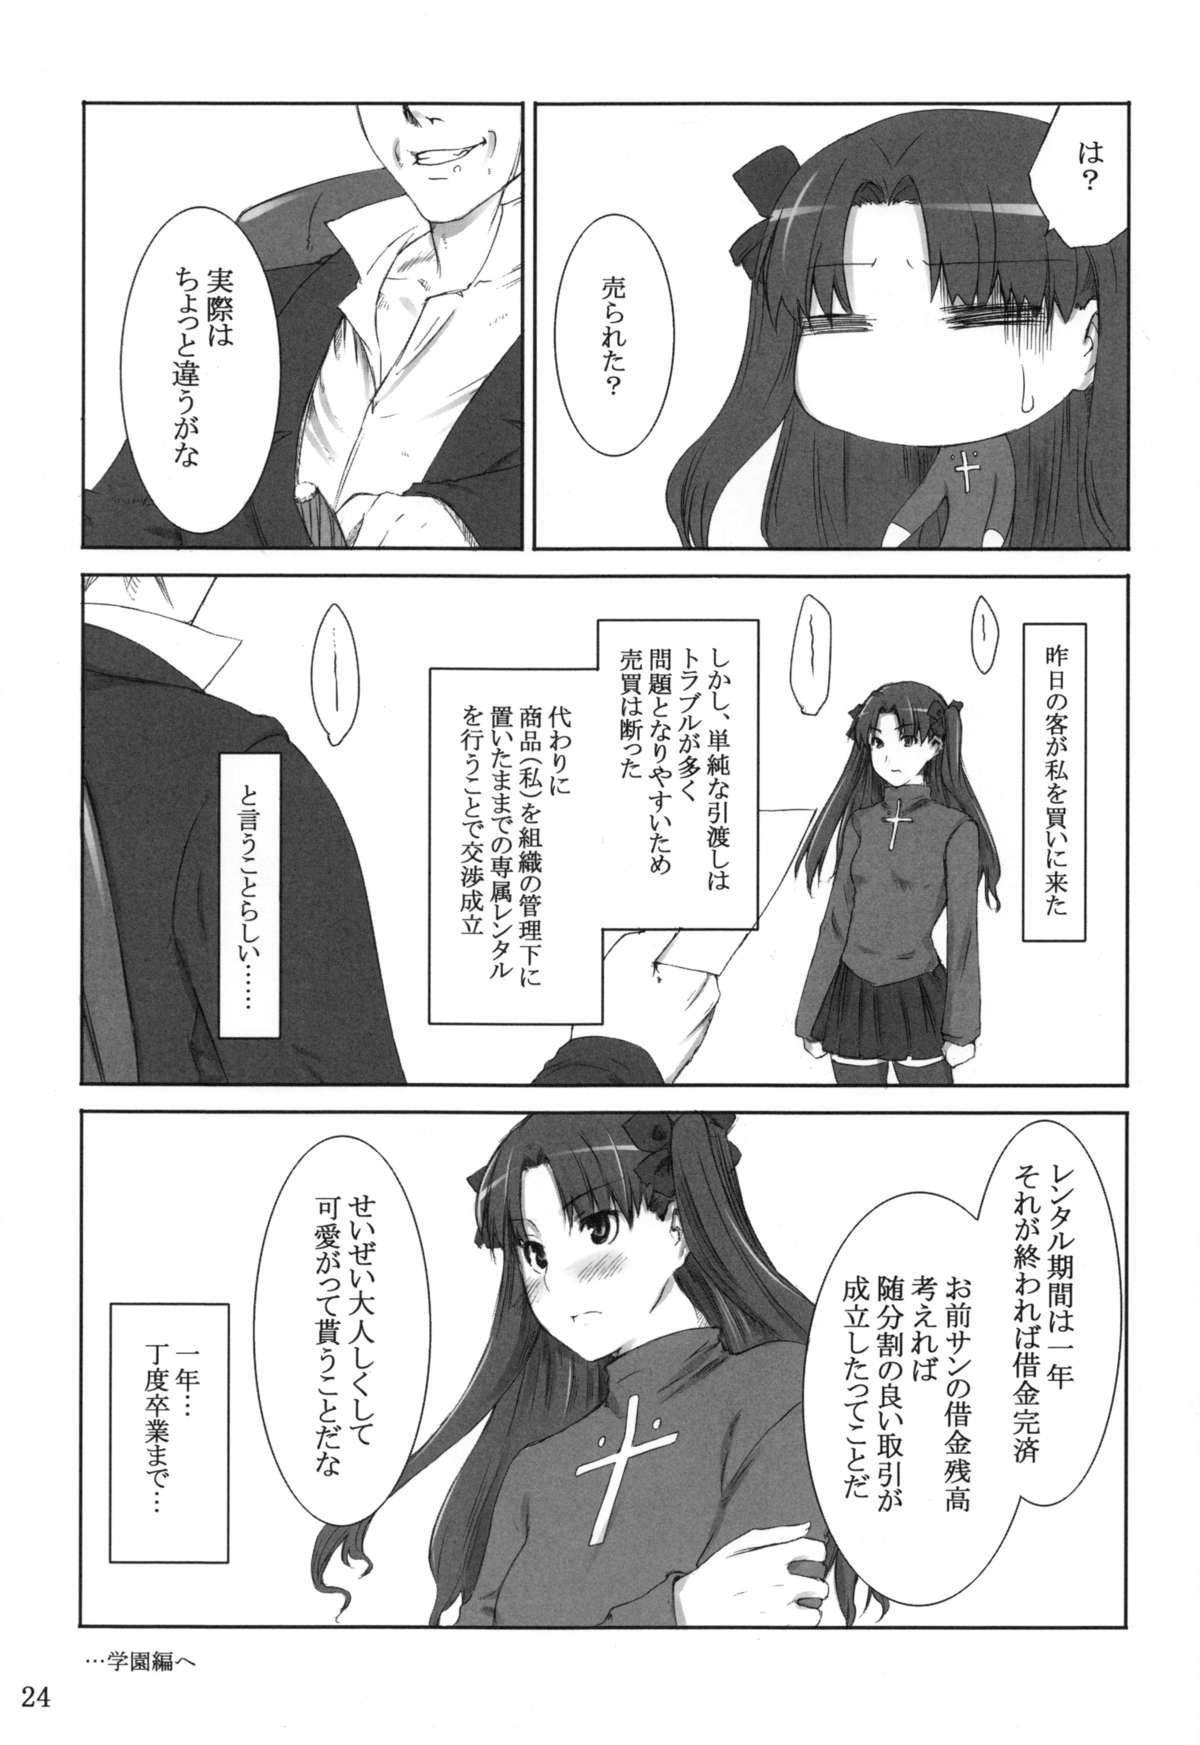 Tosaka-ke no Kakei Jijou Soushuuhen 1 23